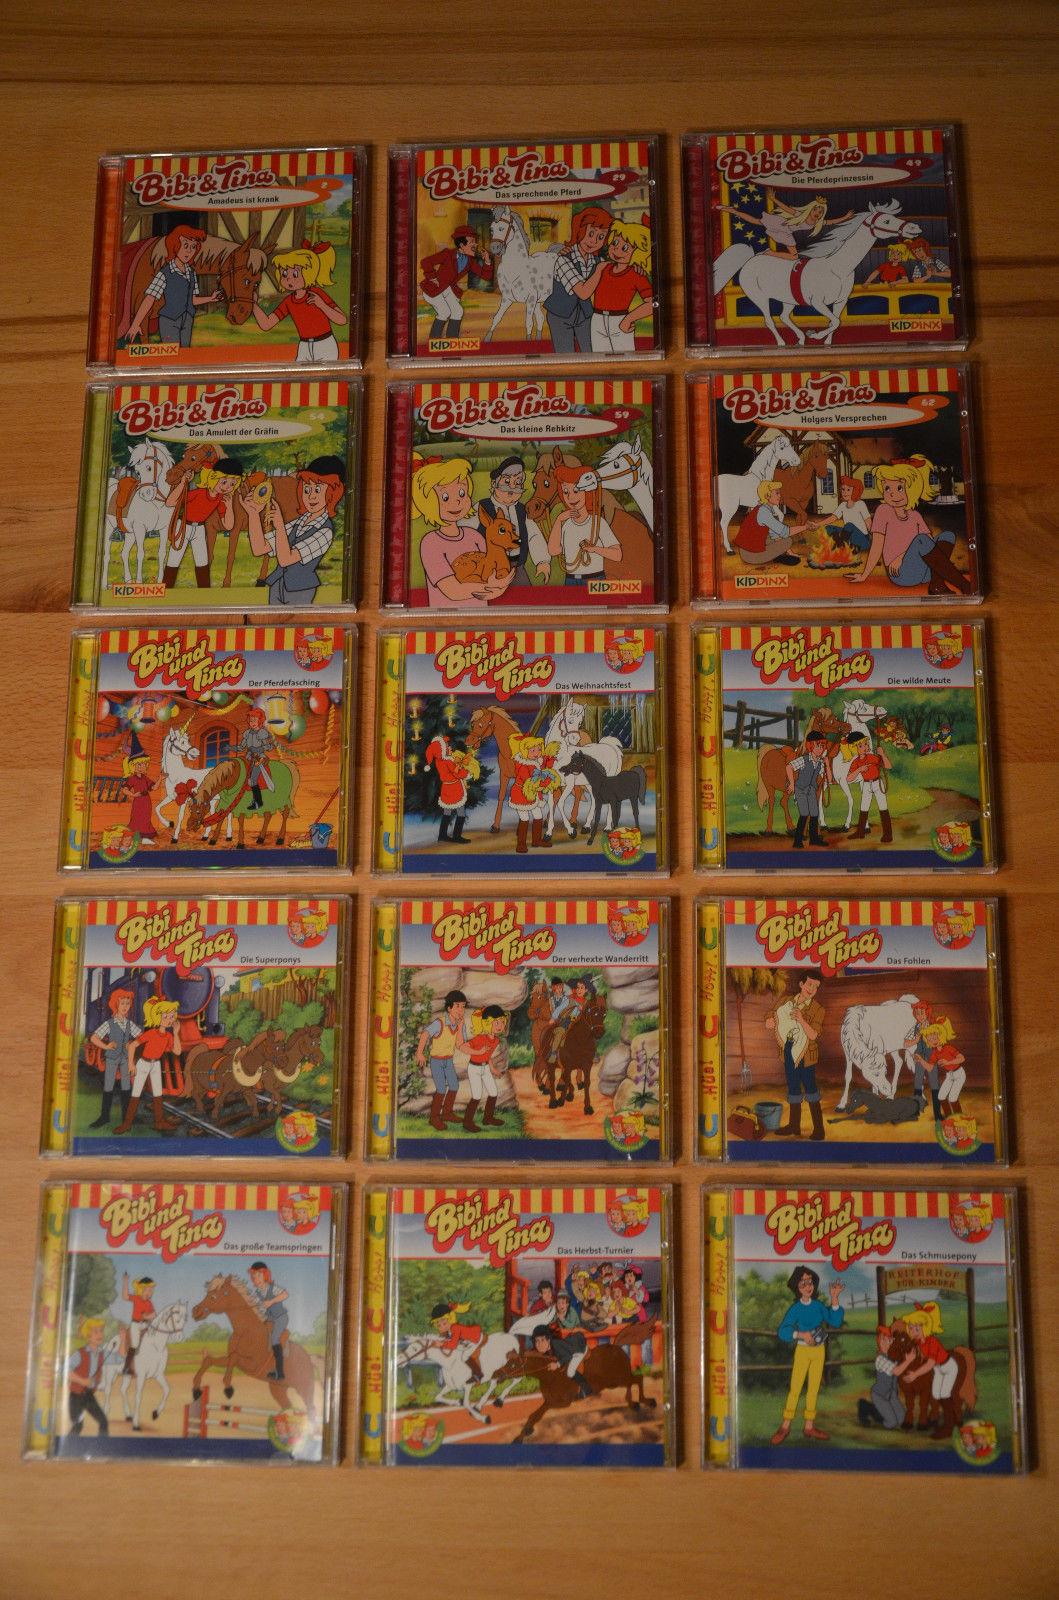 Paket Kinder CD`s Bibi und Tina  Hörspiel 15 CD`s  TOP